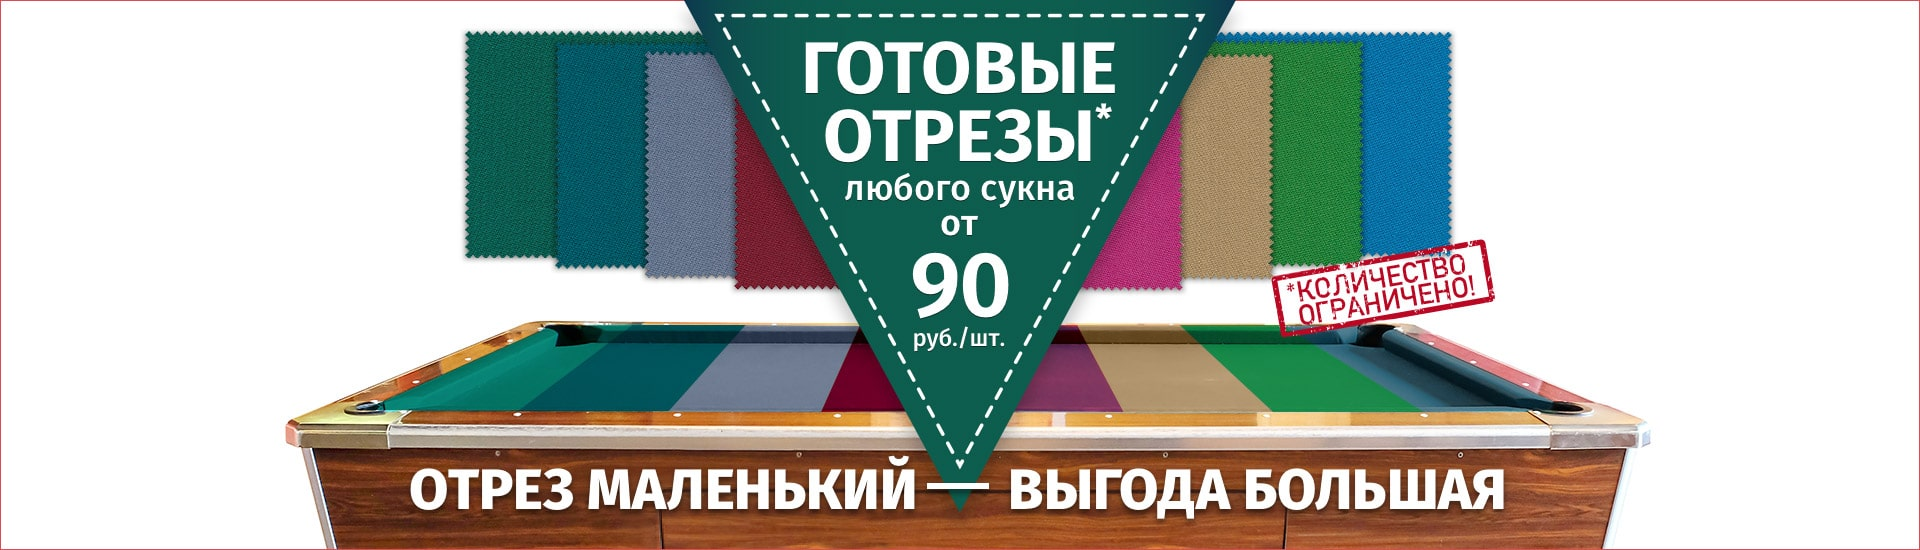 1920x550-cloth